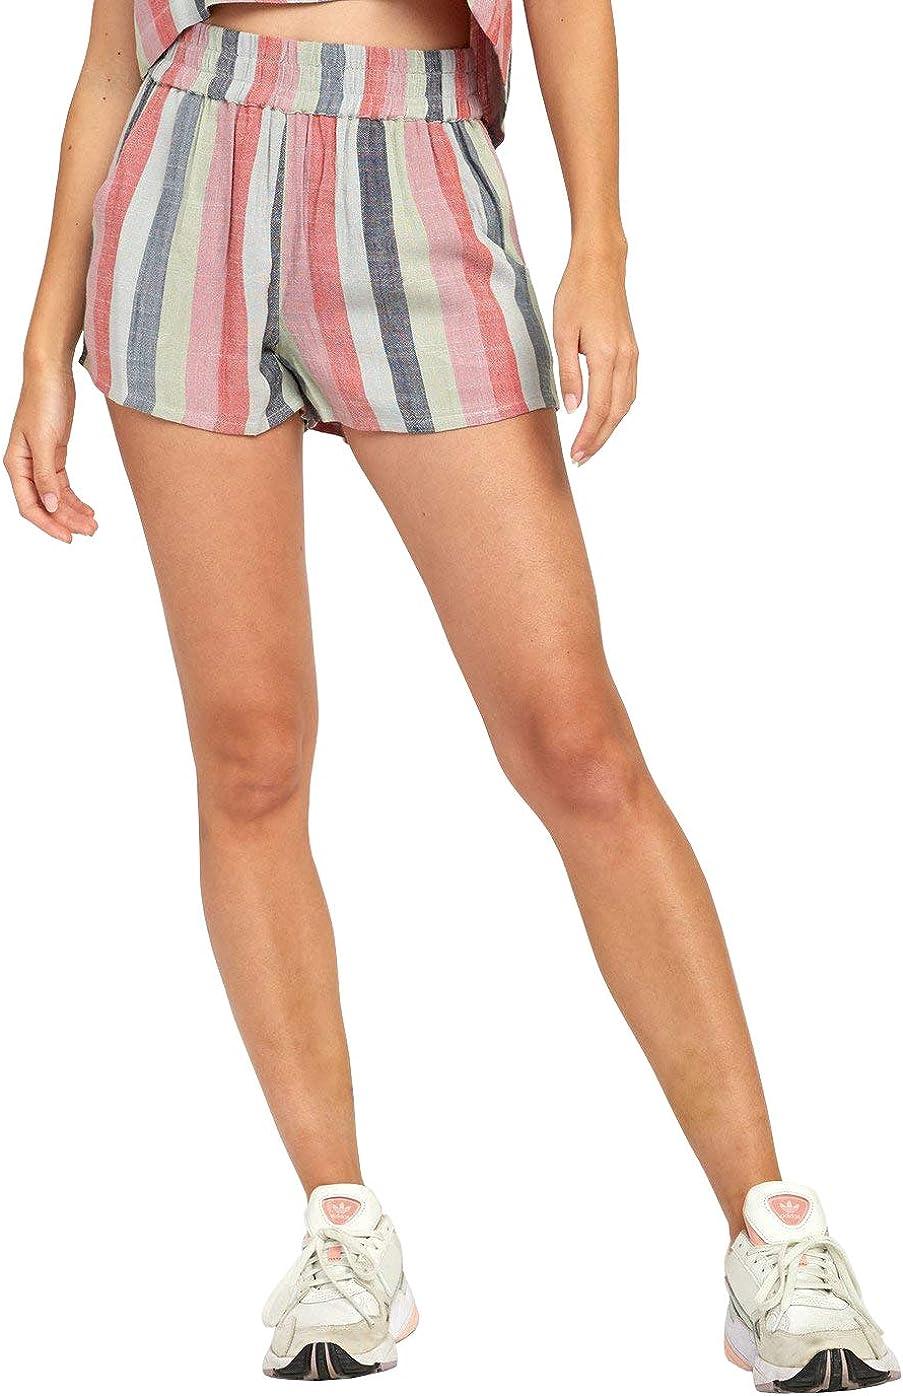 RVCA Women's Max 57% OFF Suggest overseas Short Stripe